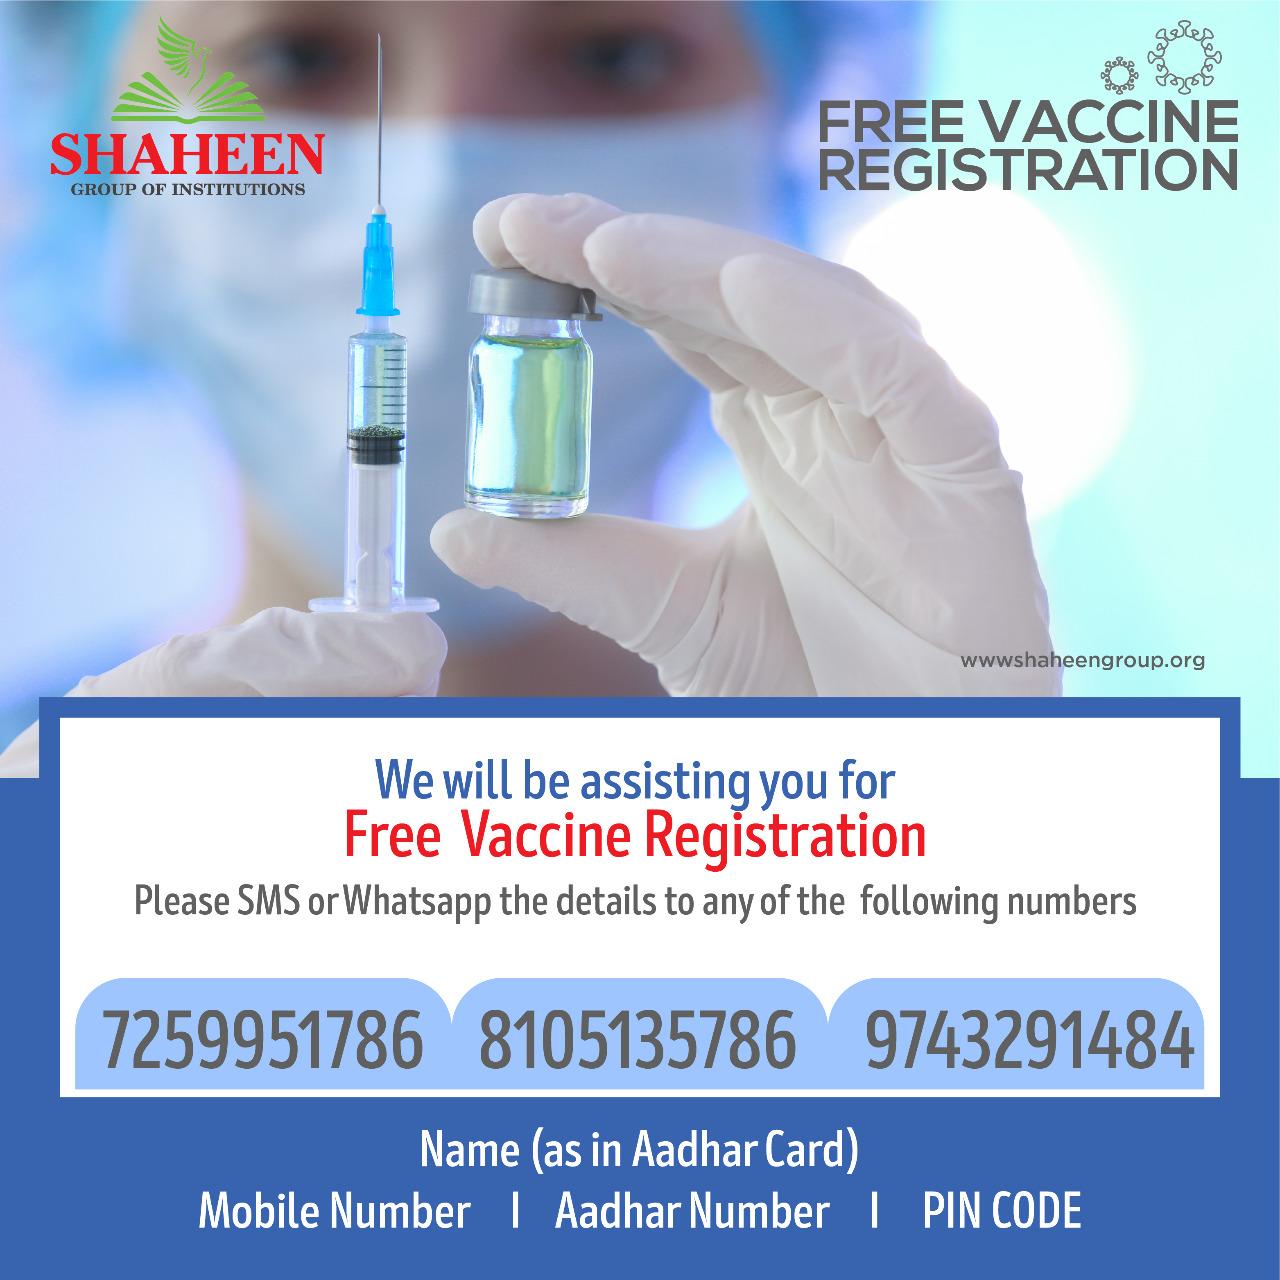 Free Vaccine Registration